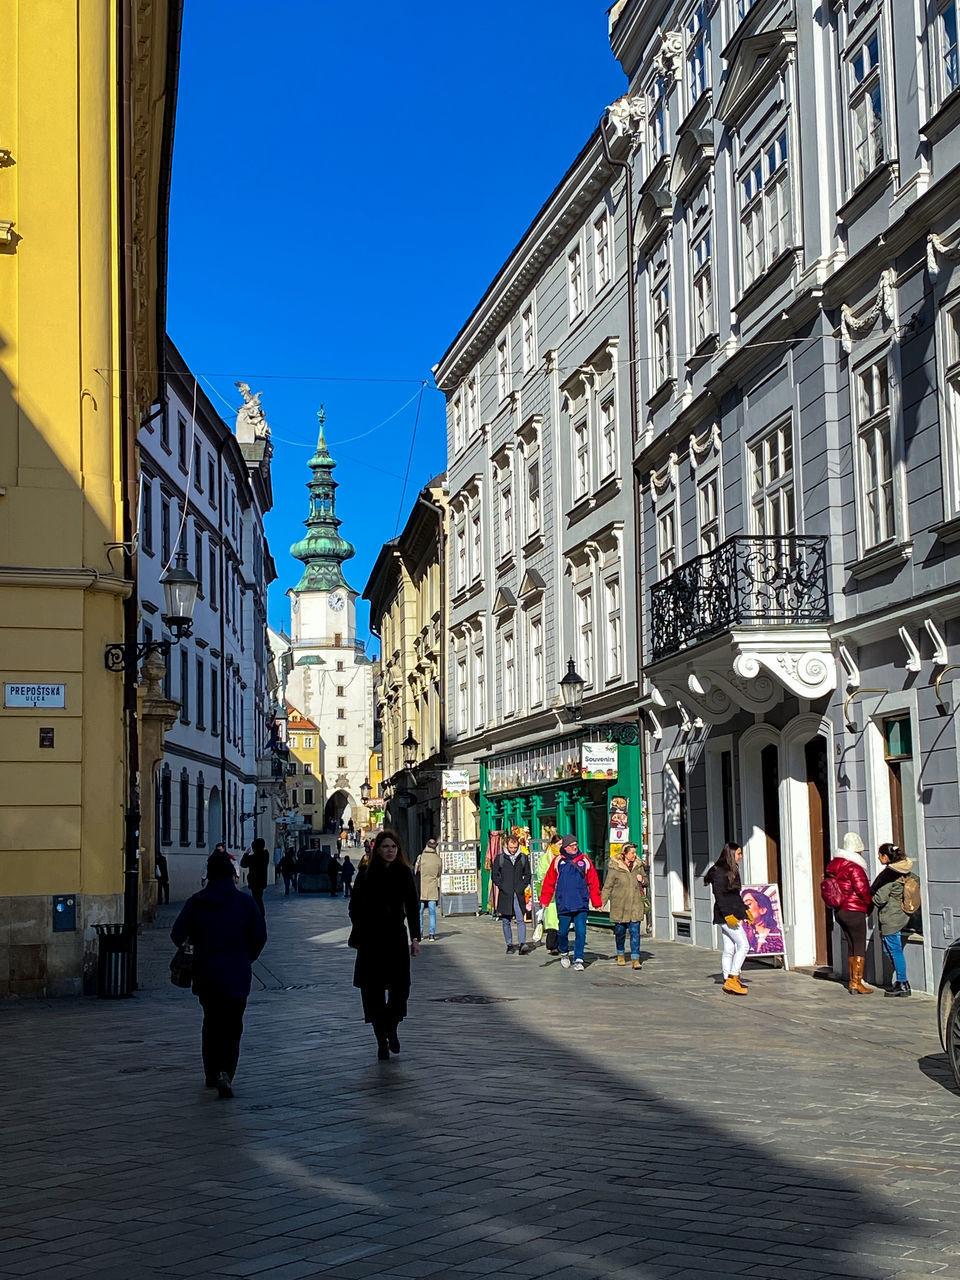 PEOPLE WALKING ON STREET AMIDST BUILDINGS IN CITY AGAINST CLEAR SKY